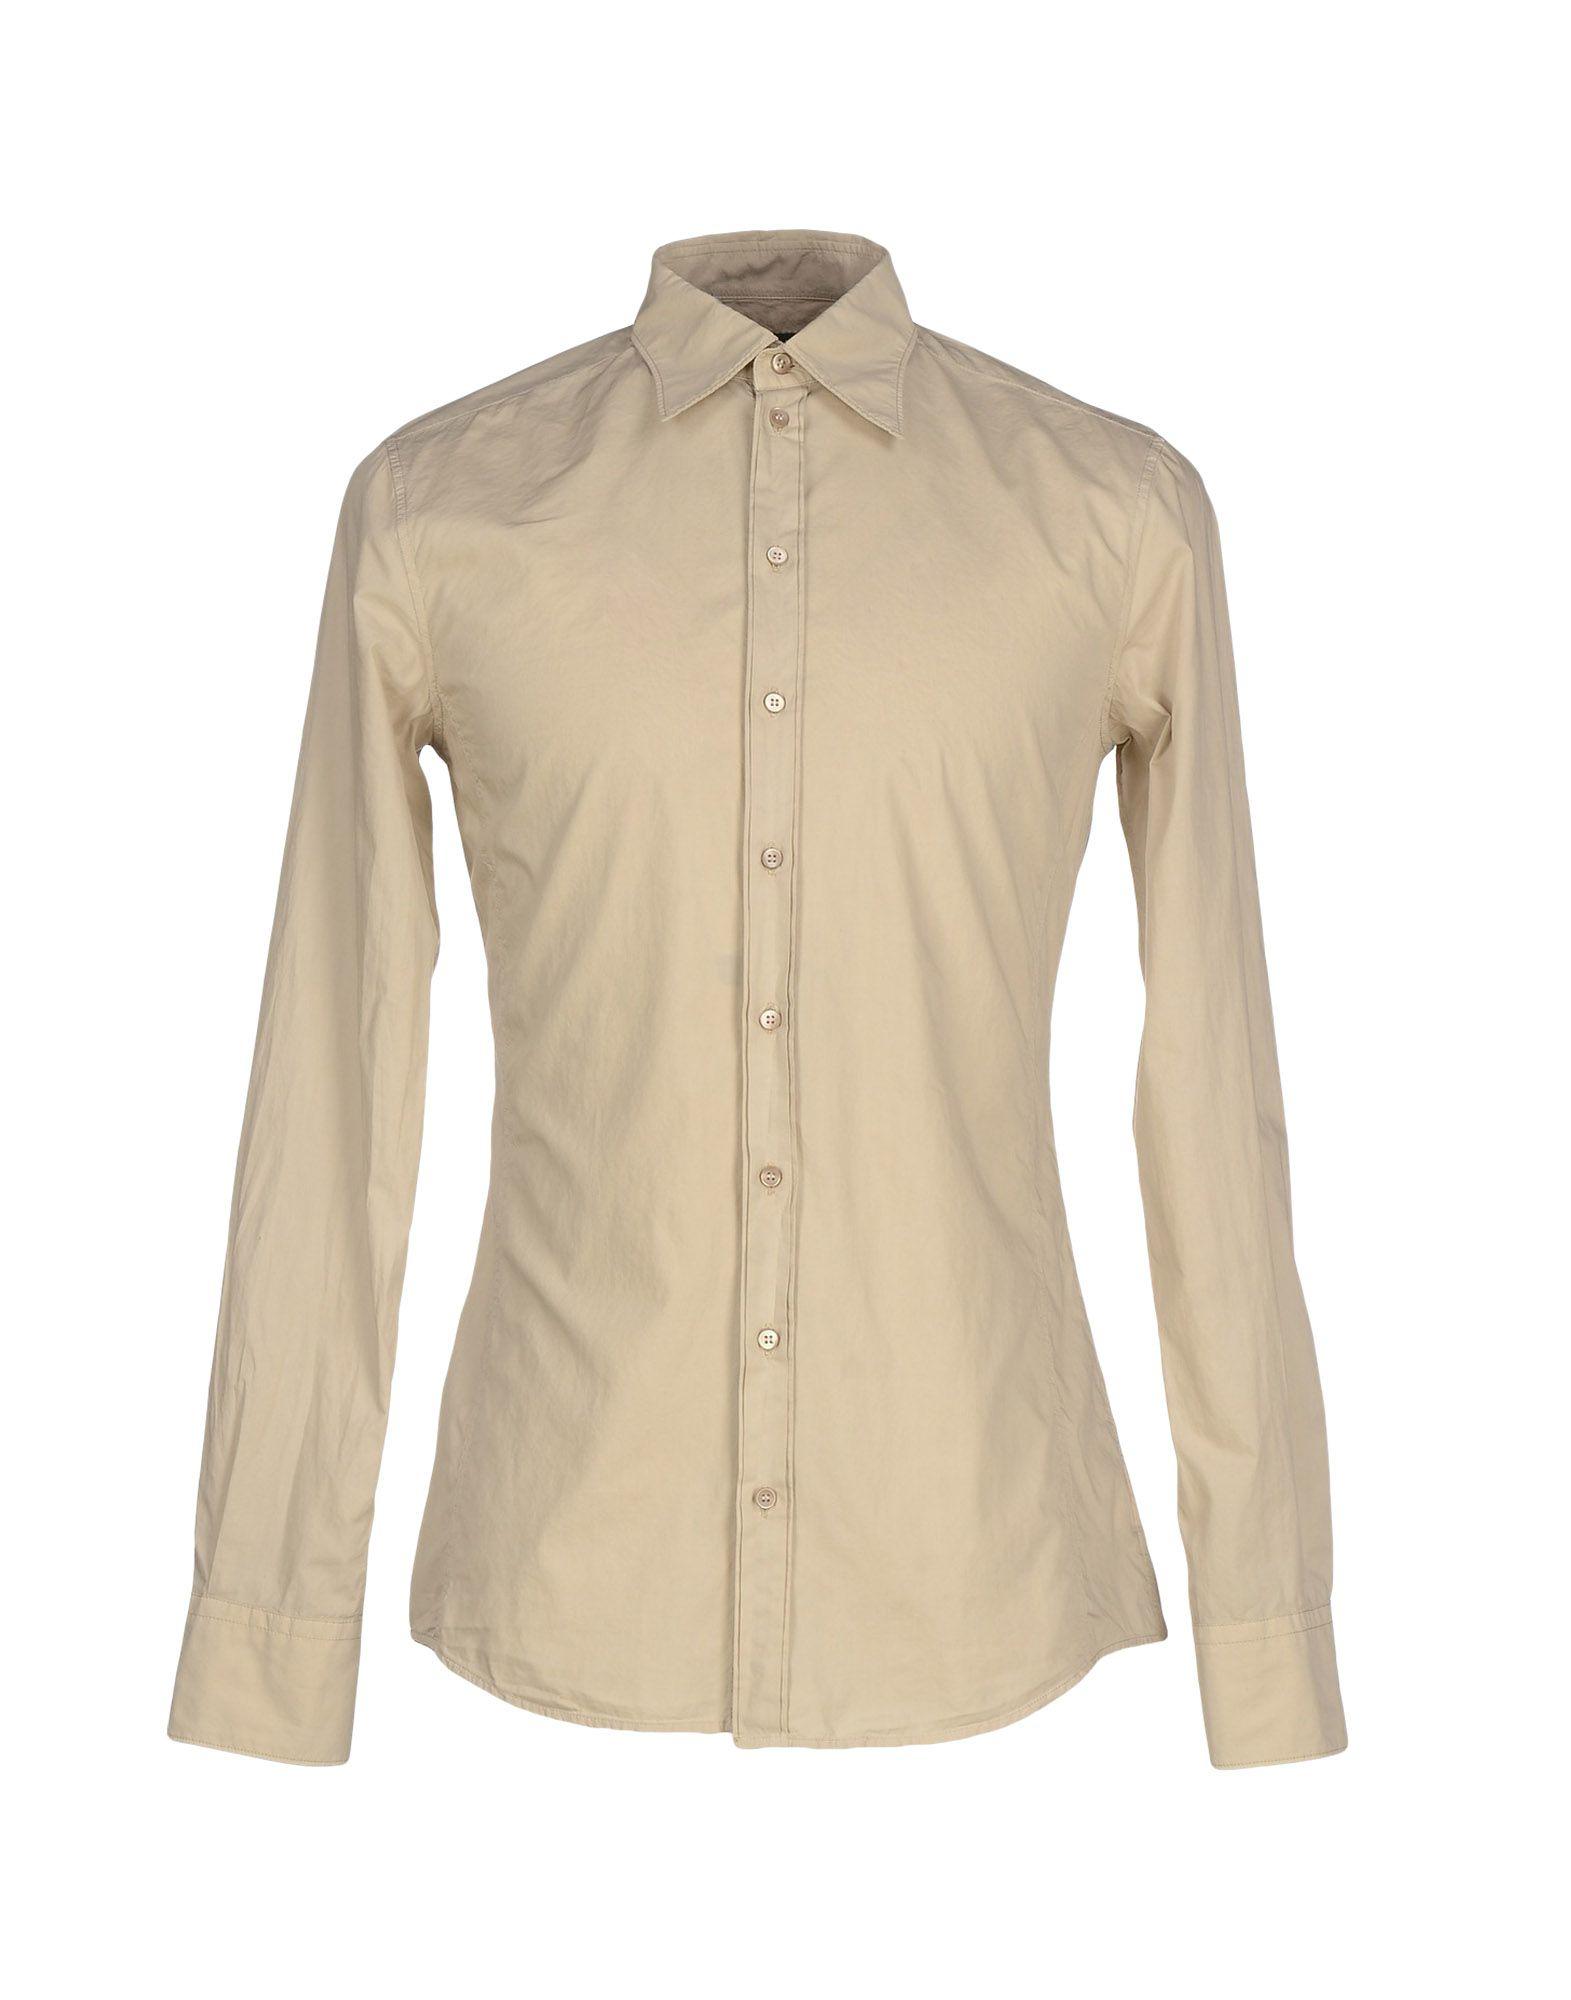 Dolce & gabbana Shirt in Natural for Men